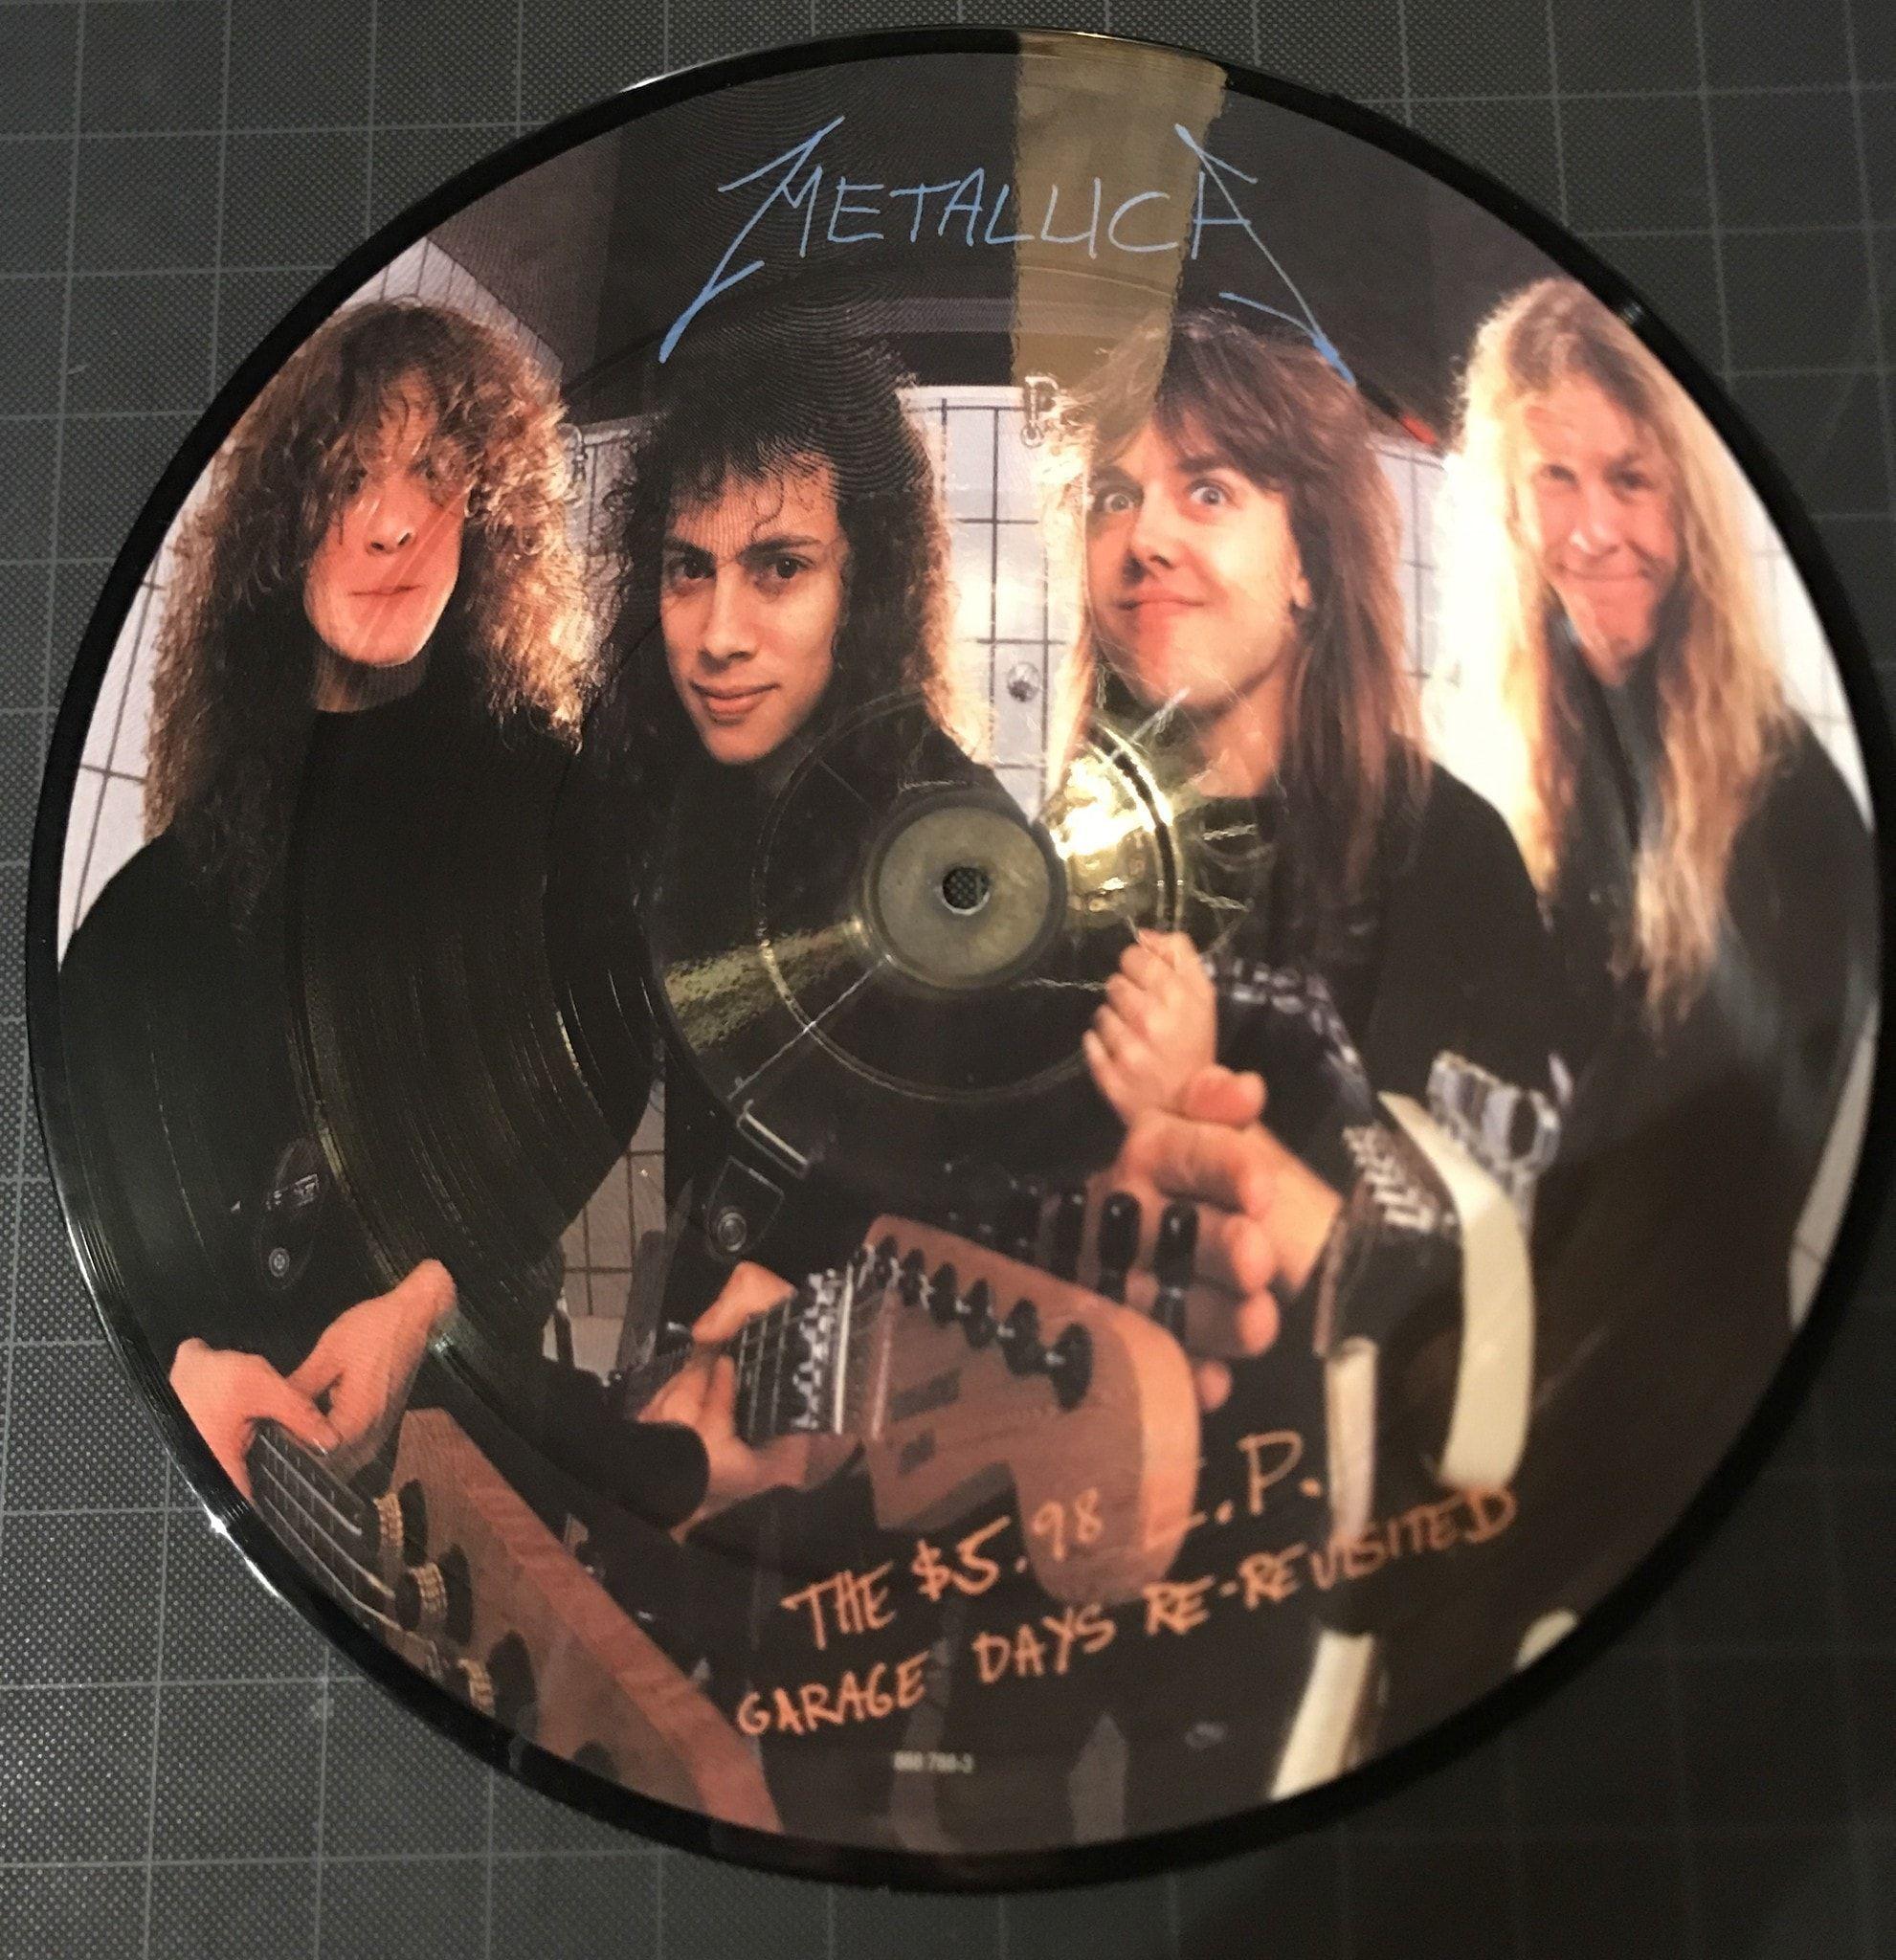 Metallica - The $5 98 E P  Garage Days Re-Revisited (Picture